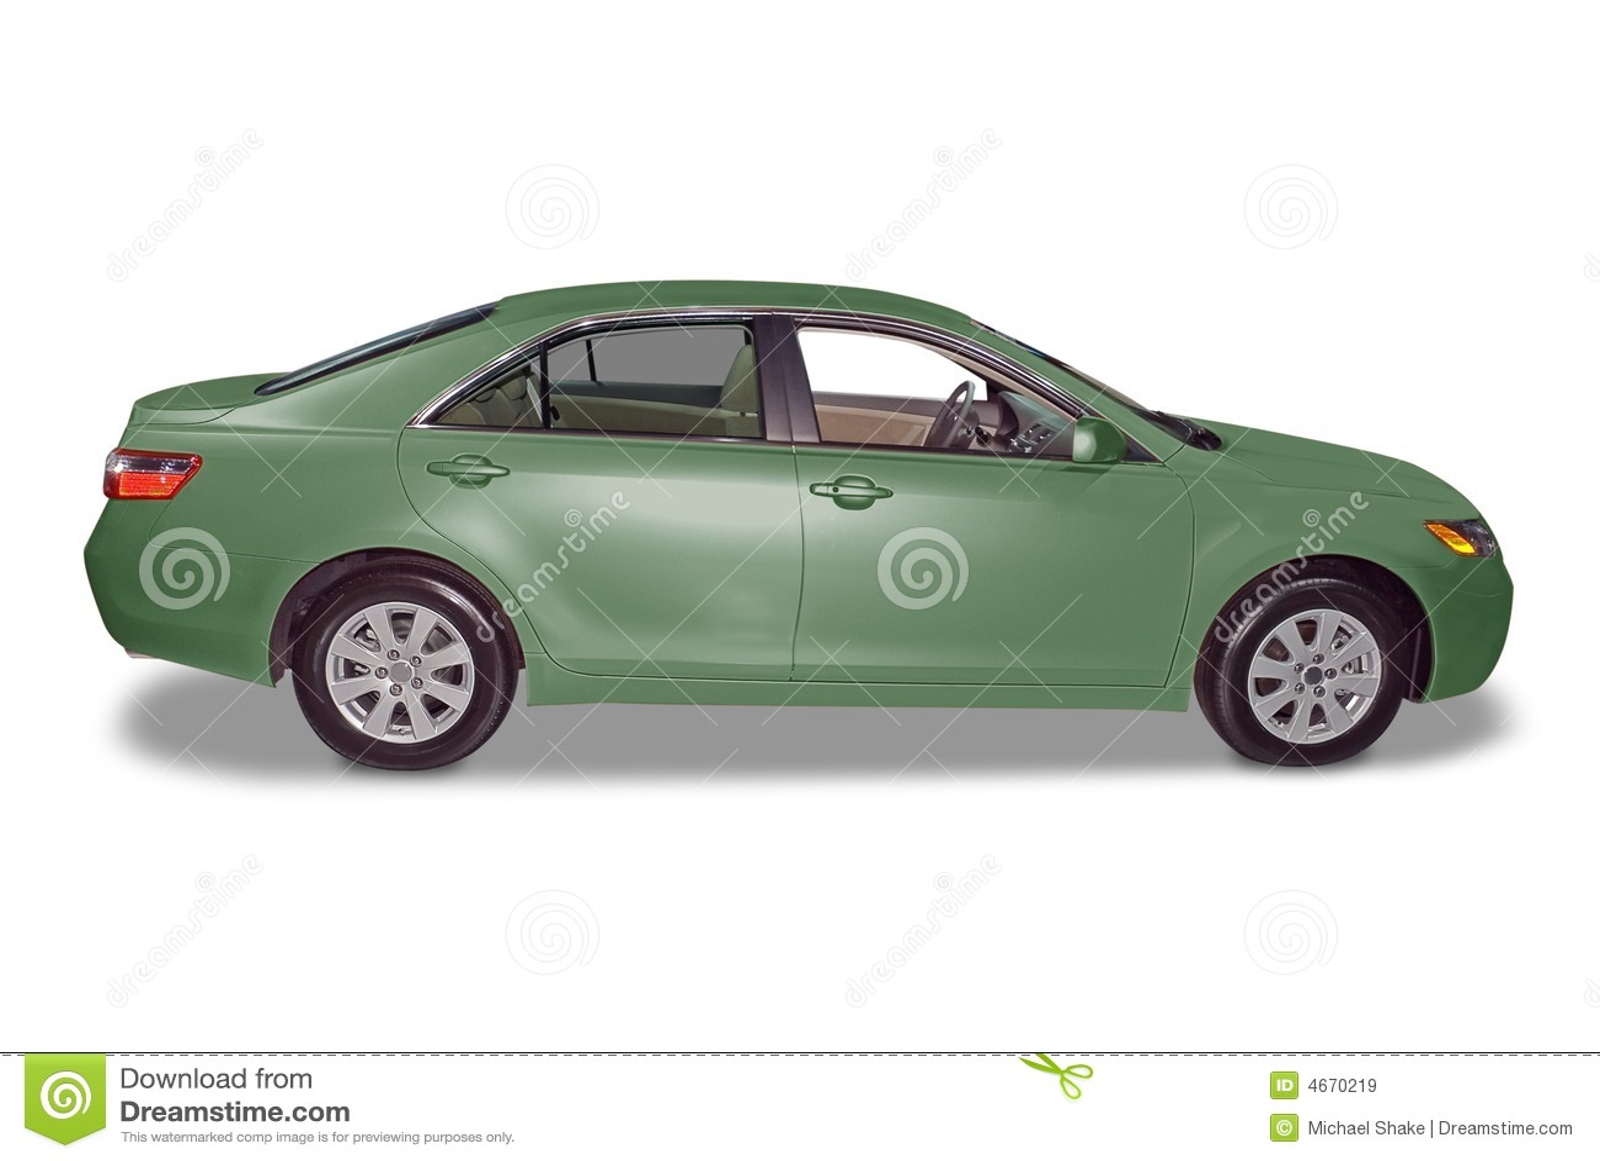 Samochód hybrydowy nowy.